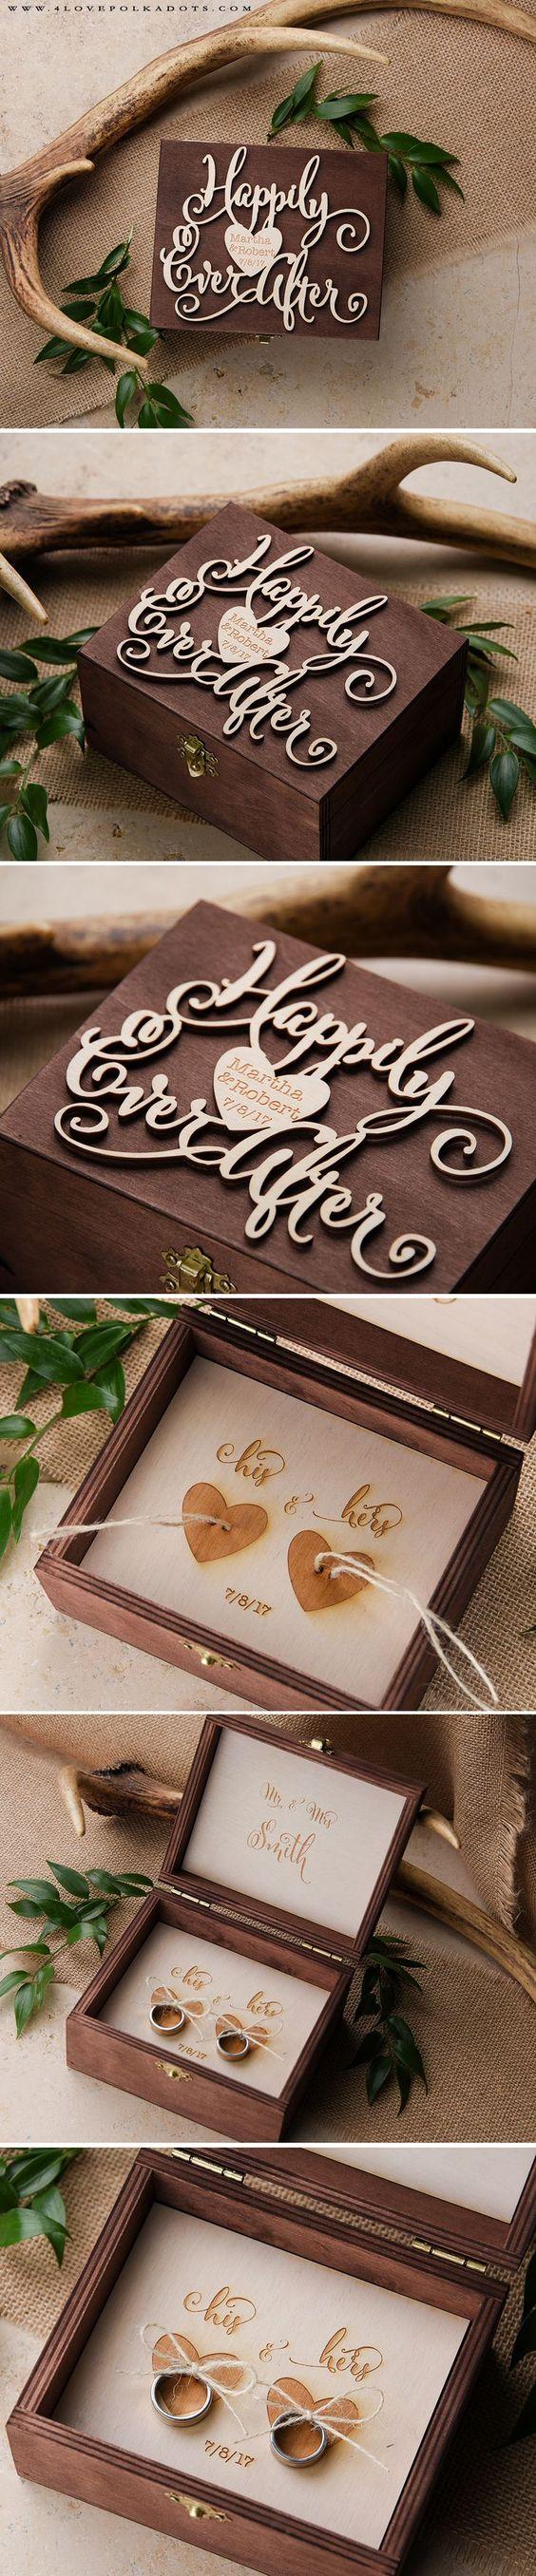 Happily Ever After ♥ Wedding Wooden Ring Bearer Box #weddingideas #boho #rustic…